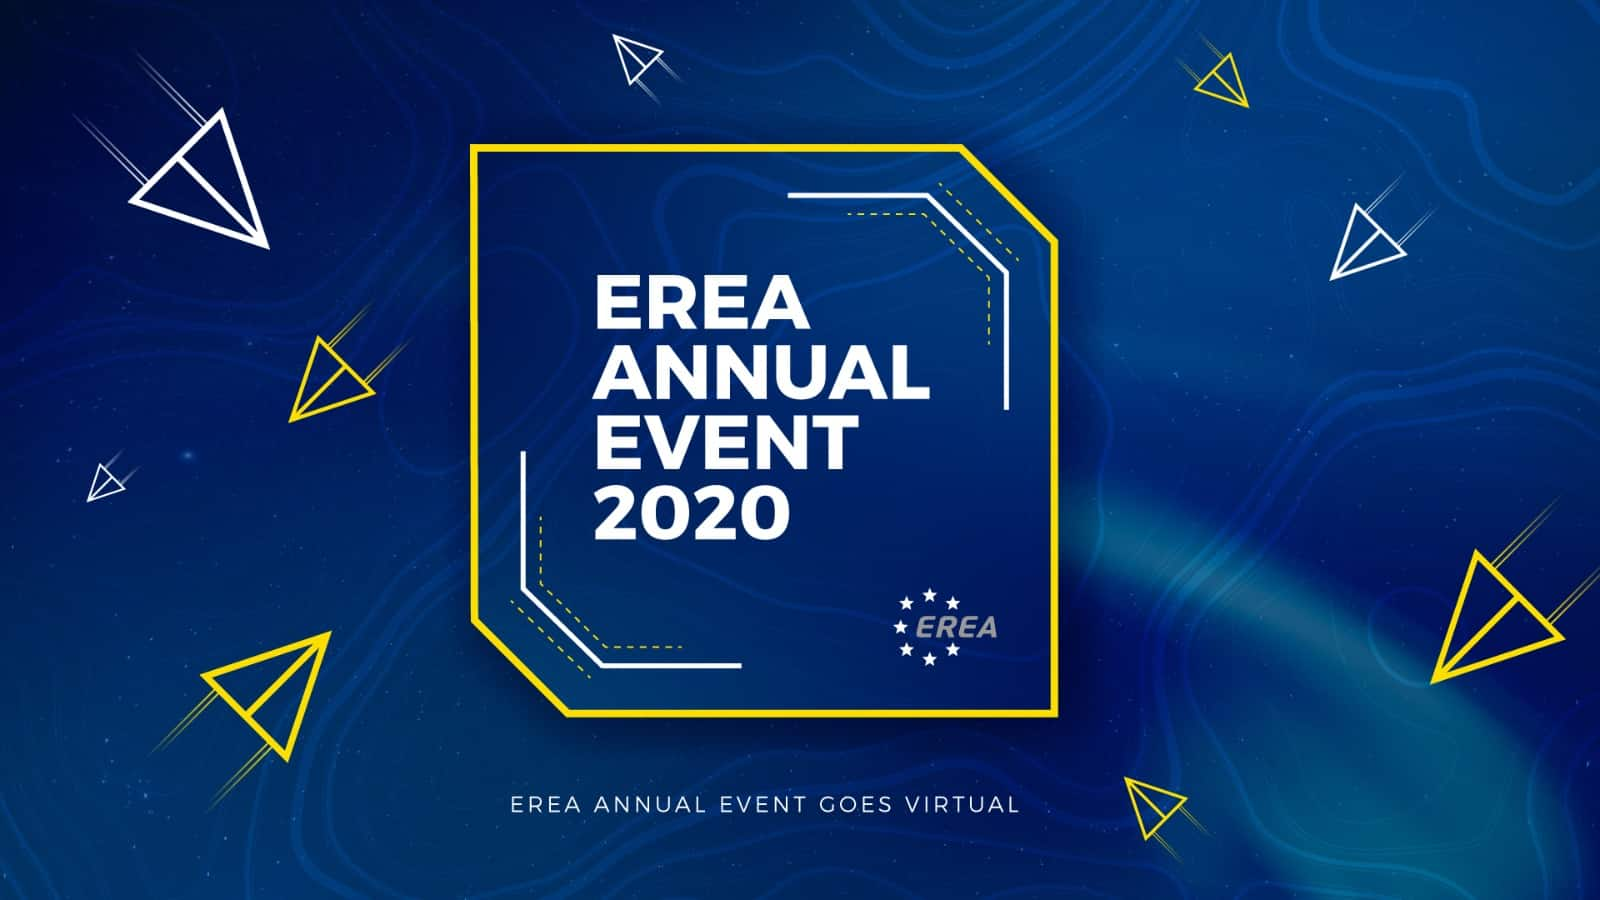 EREA Annual Event Goes Virtual! 16th of November, 2020